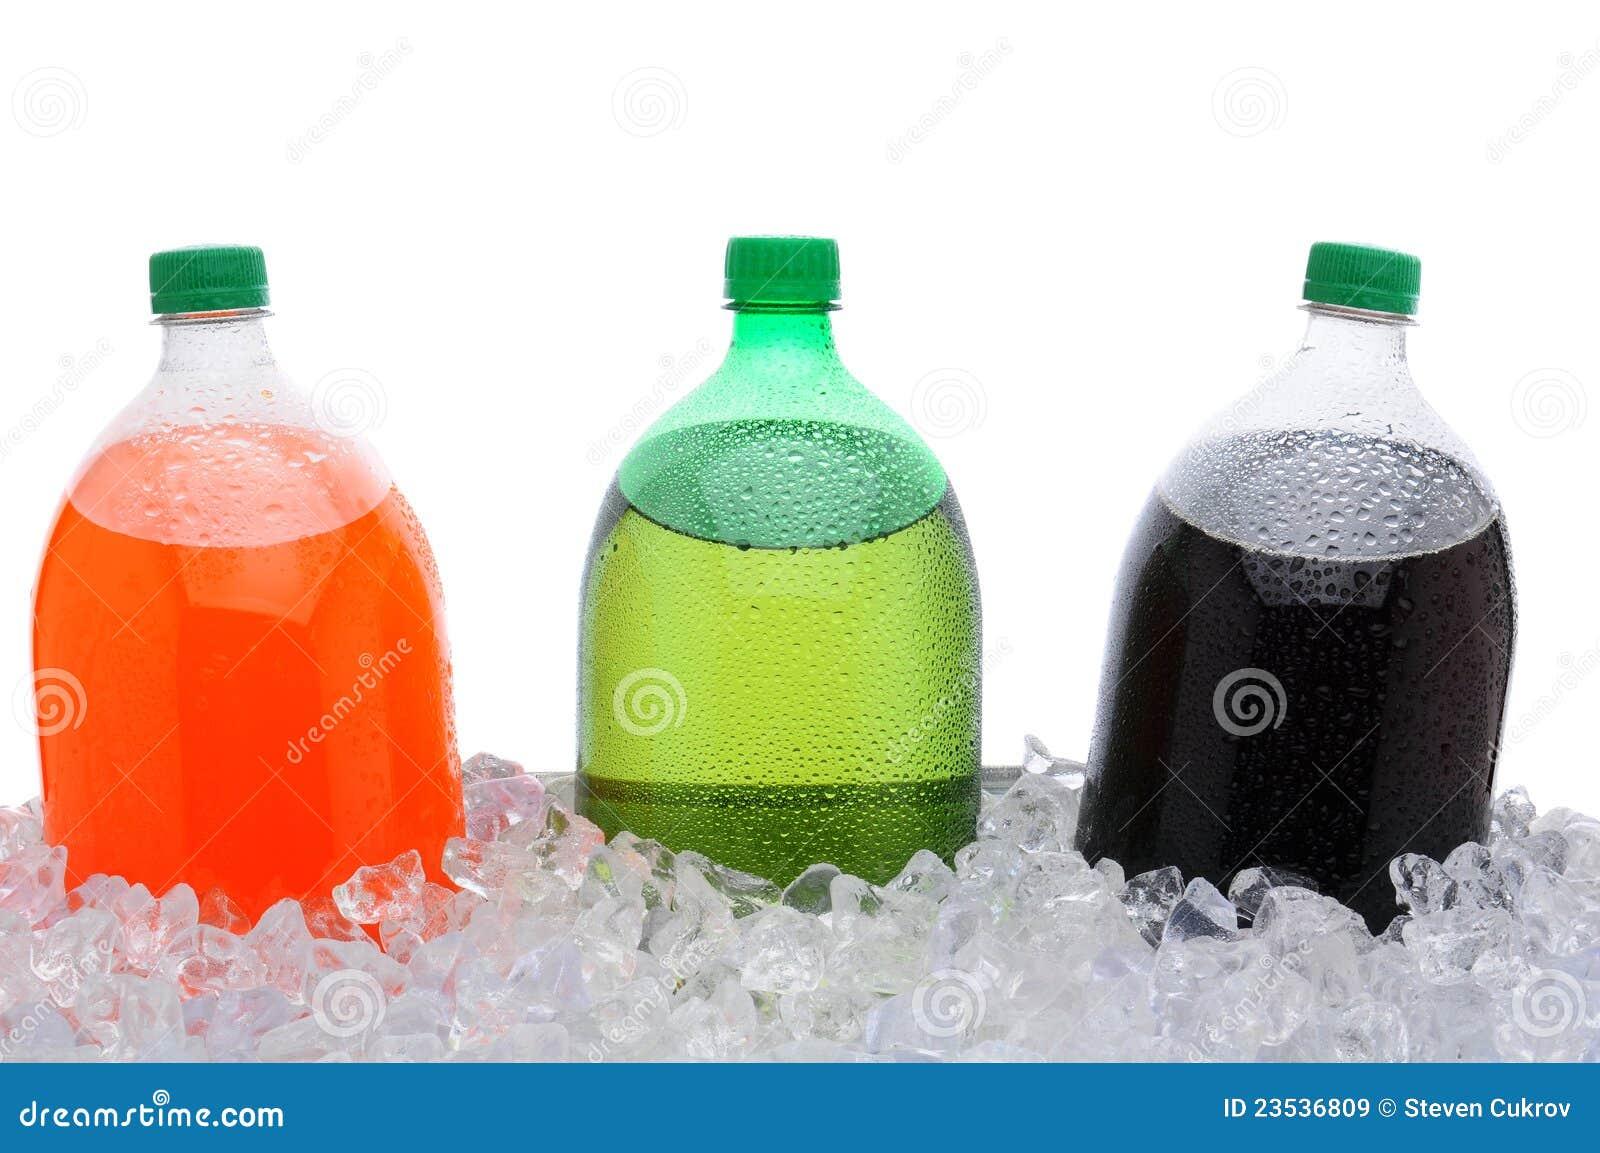 2 Liter Soda Bottles In Ice Stock Image - Image of